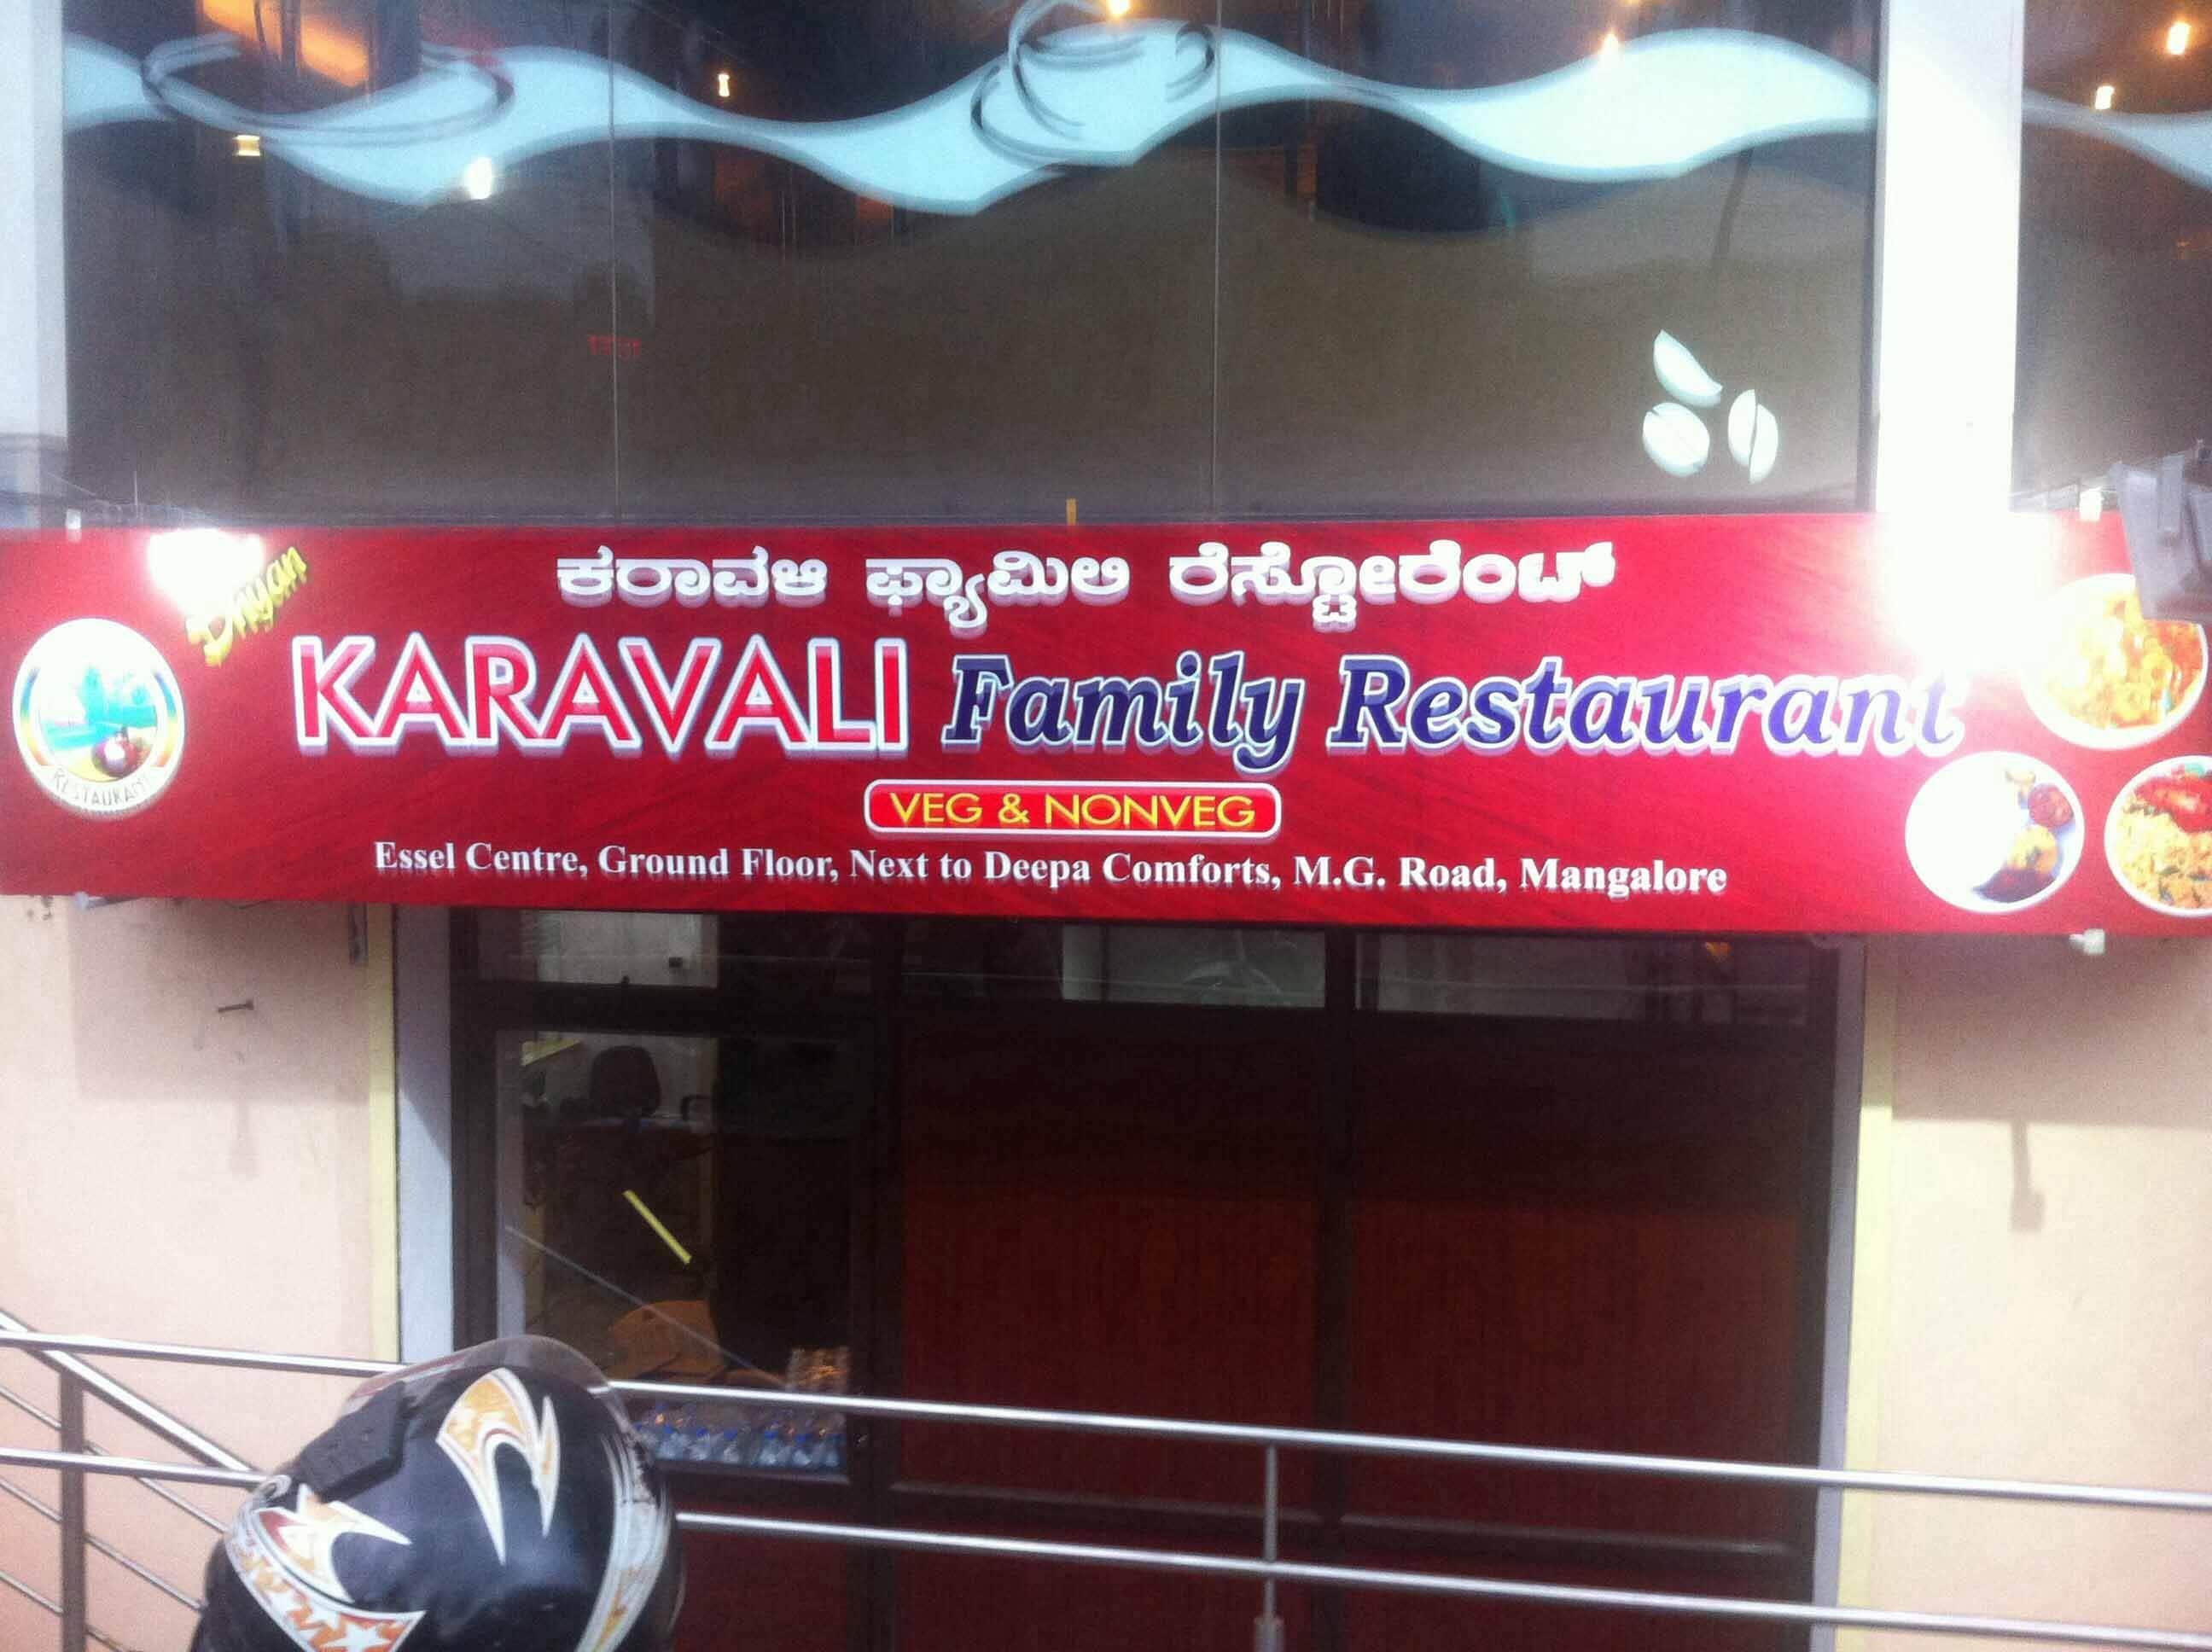 Karavali Family Restaurant - Lalbagh - Mangalore Image